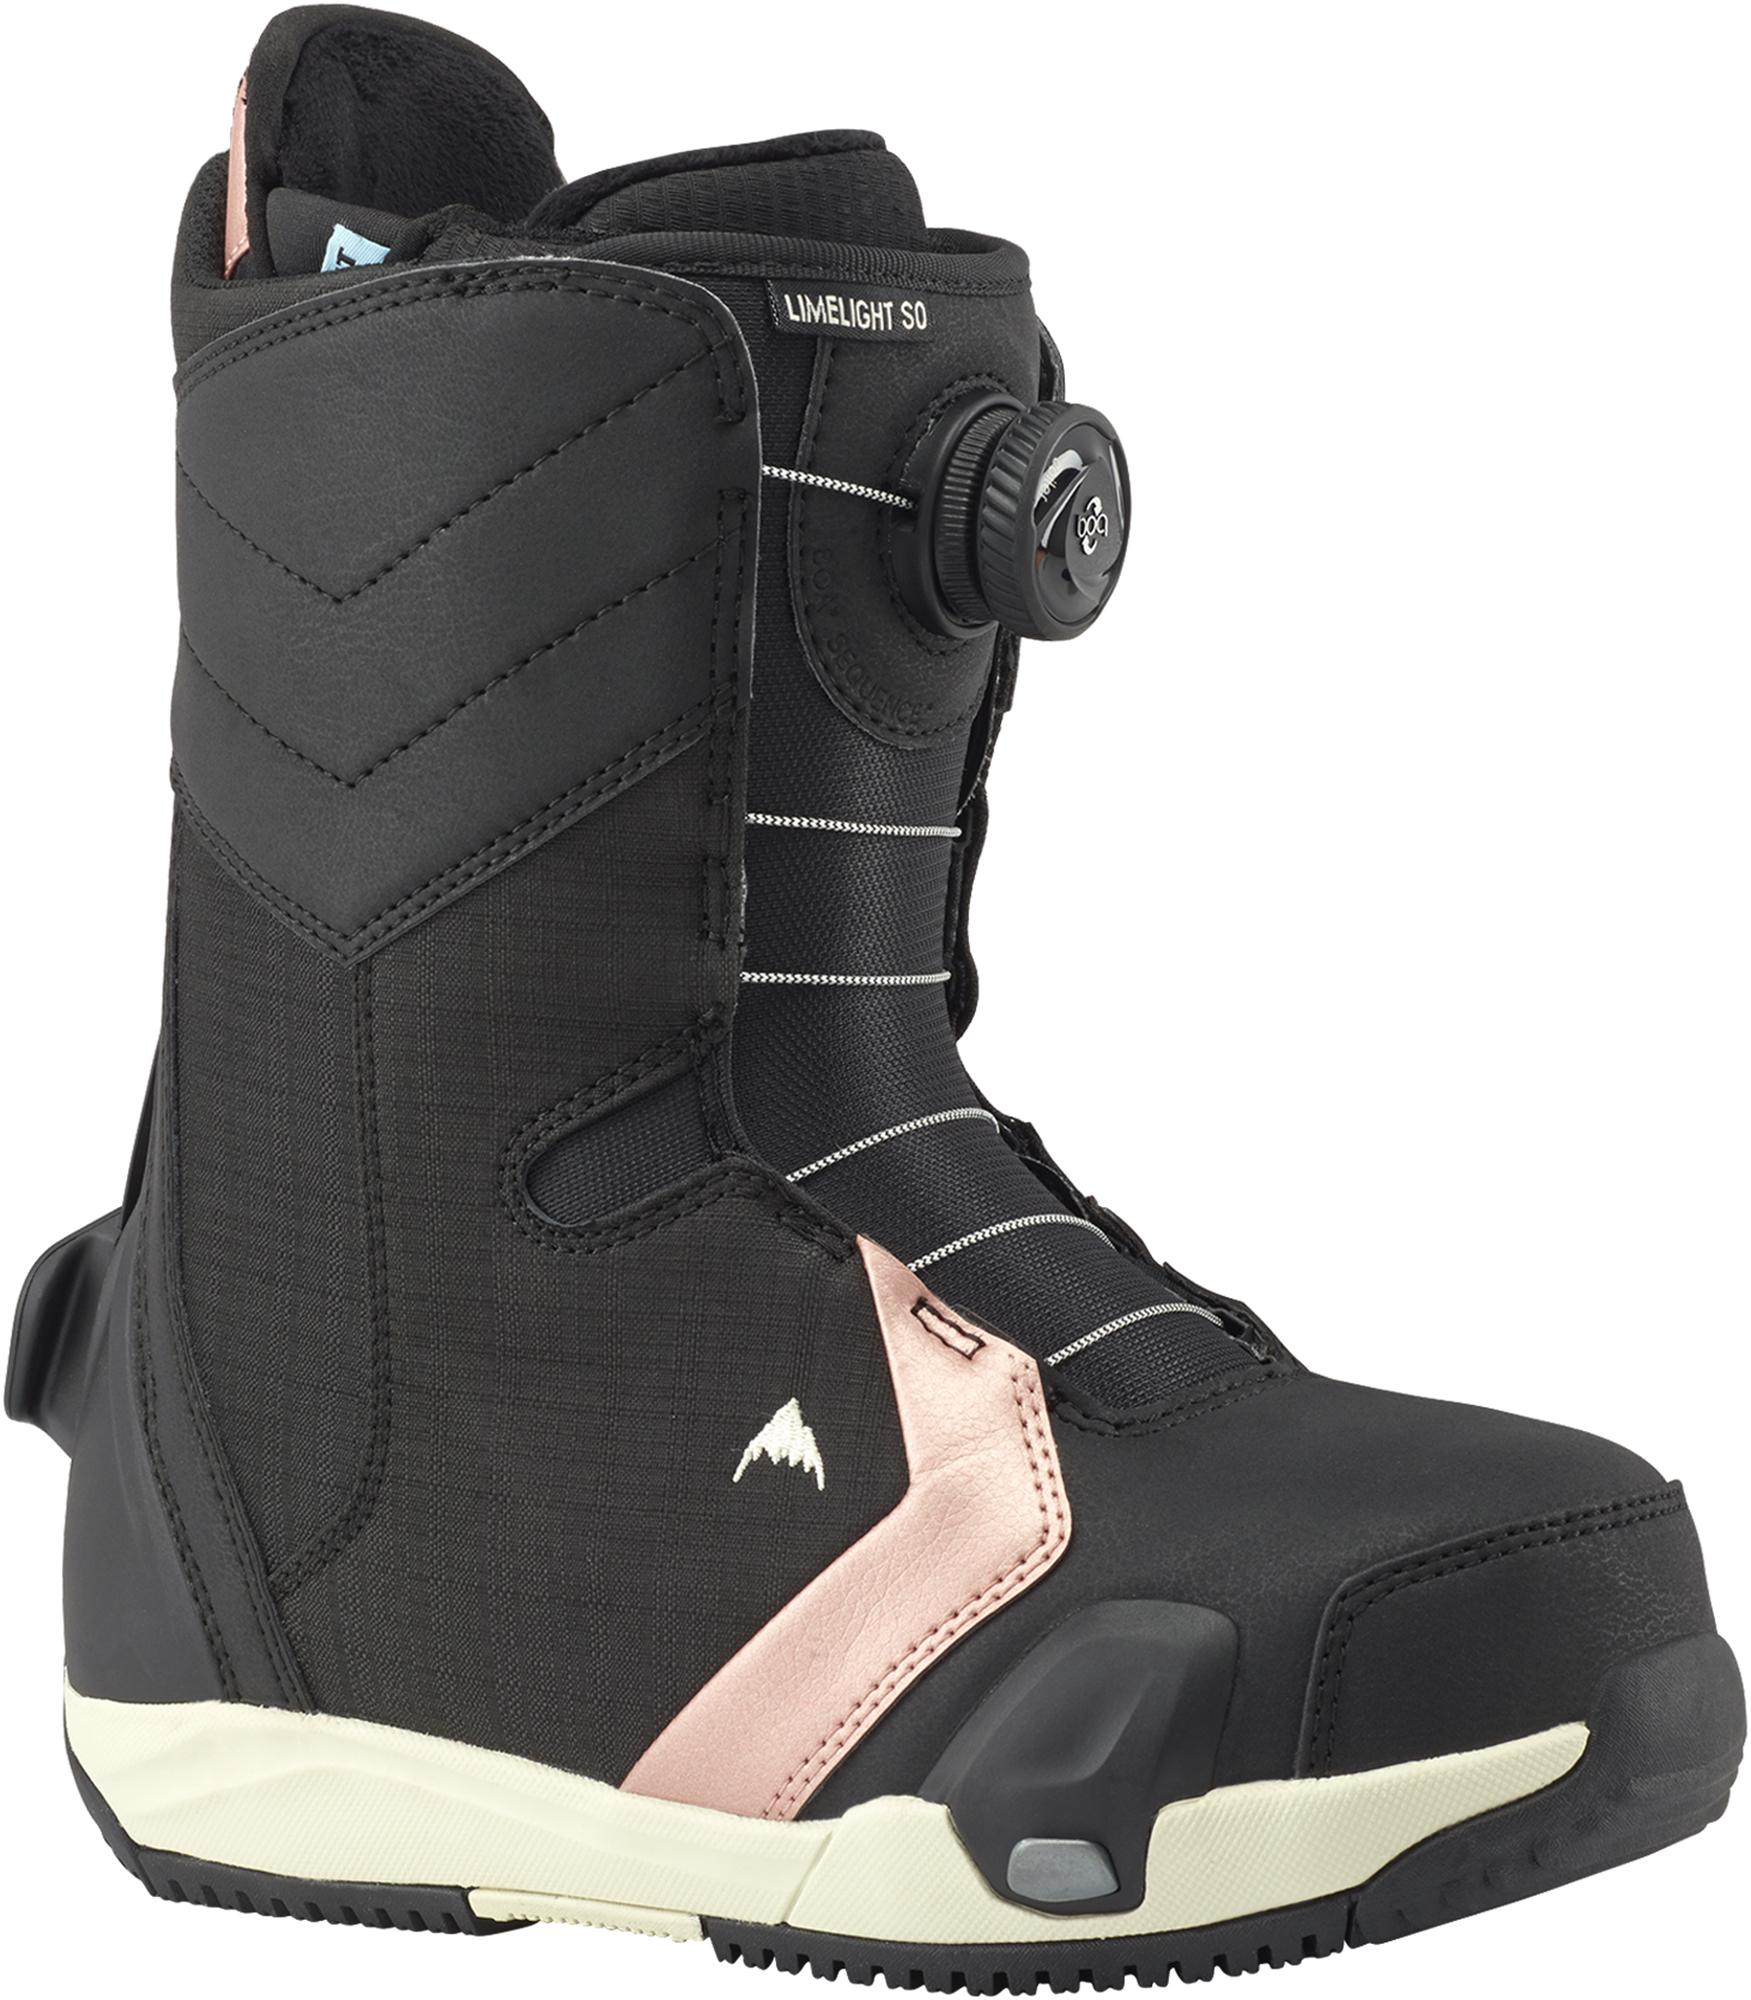 Burton Сноубордические ботинки женские Burton Limelight Step On, размер 37 цены онлайн